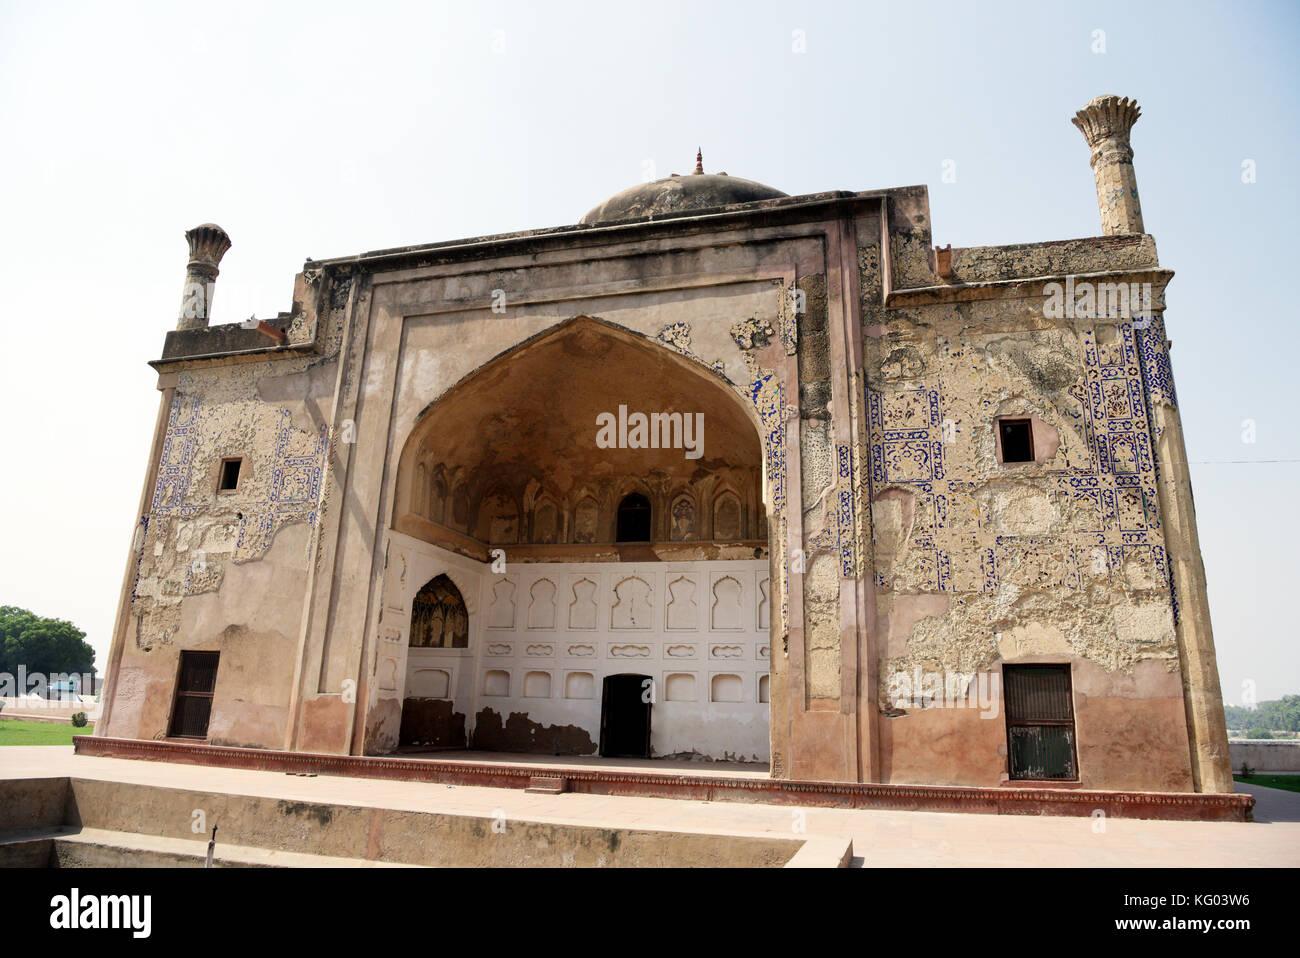 Chini ka Rauza in Agra. Chini ka Rauza is the tomb of Allama Afzal Khan Mullah, a scholar and poet who was the Prime - Stock Image